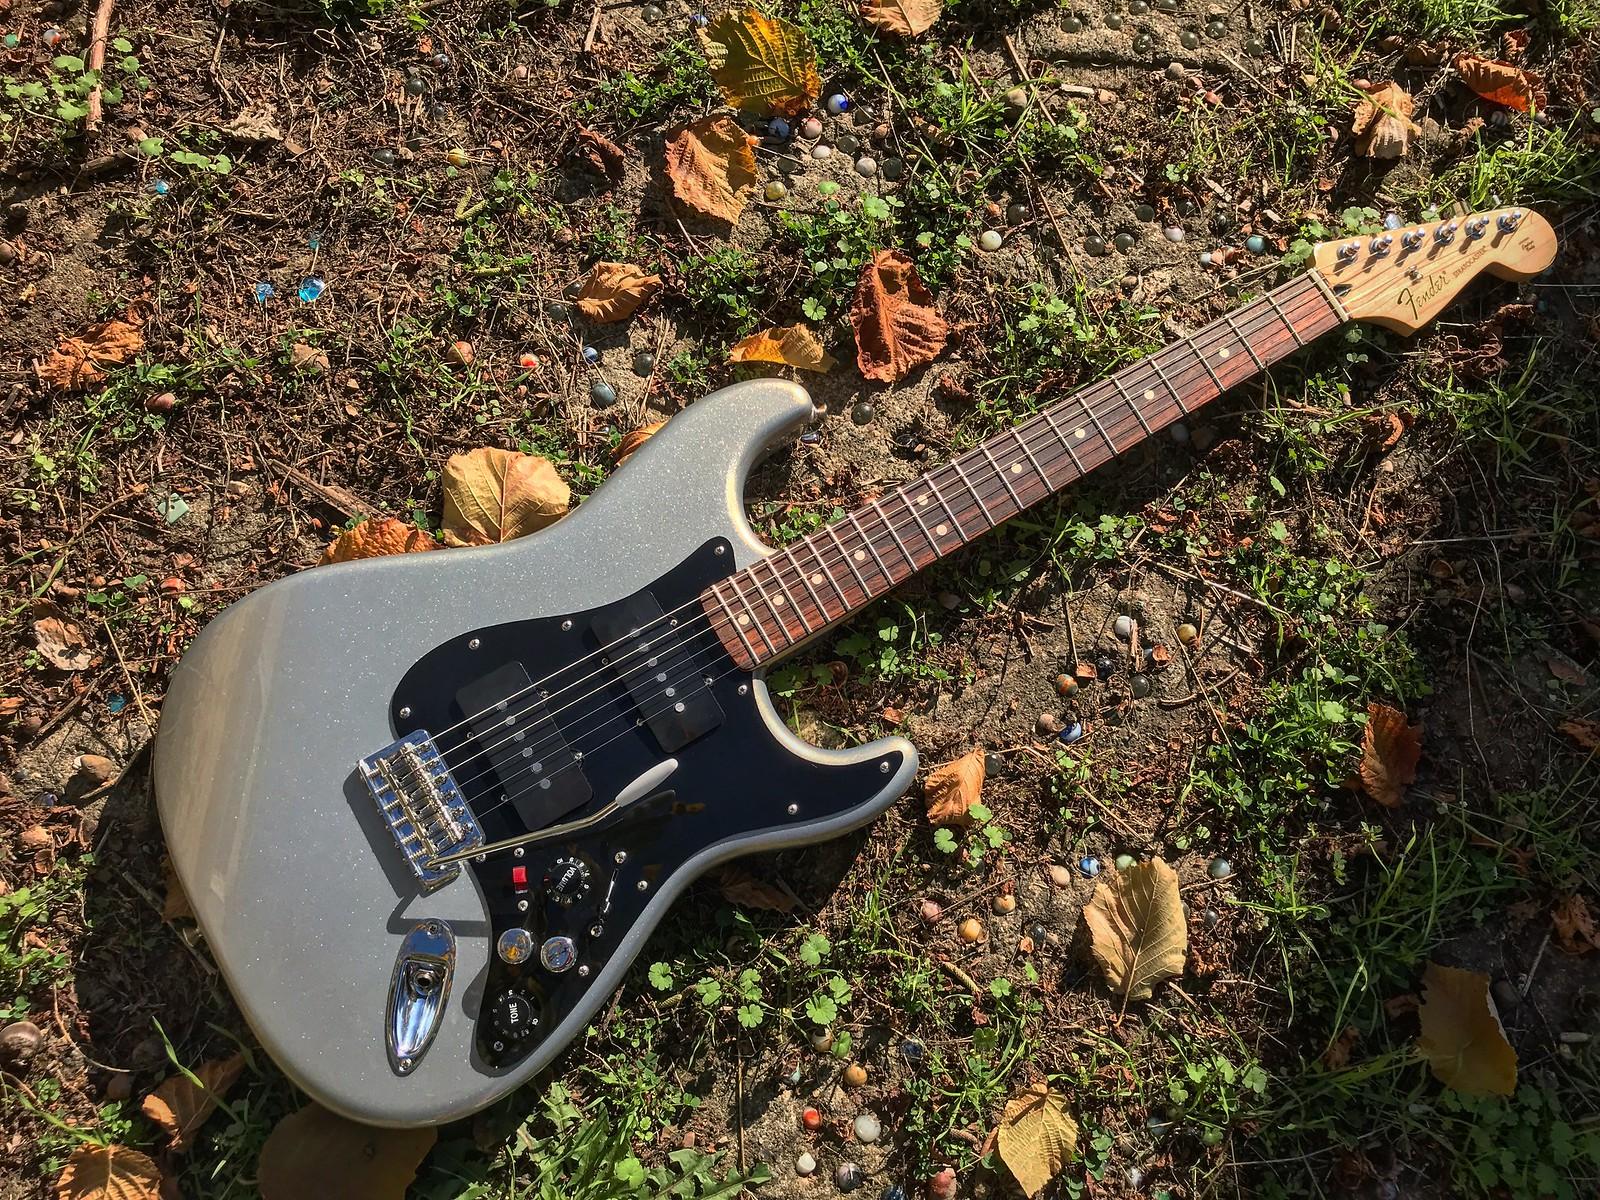 File FenderTremoloPatentDiagram moreover 1967 Fender Stratocaster Wiring Harness besides Fender Stratocaster Wiring together with 1992 93 Mij Stratocaster Wiring Diagram furthermore Lace Sensor Wiring Diagram Strat. on telecaster wiring diagram on 1954 fender stratocaster